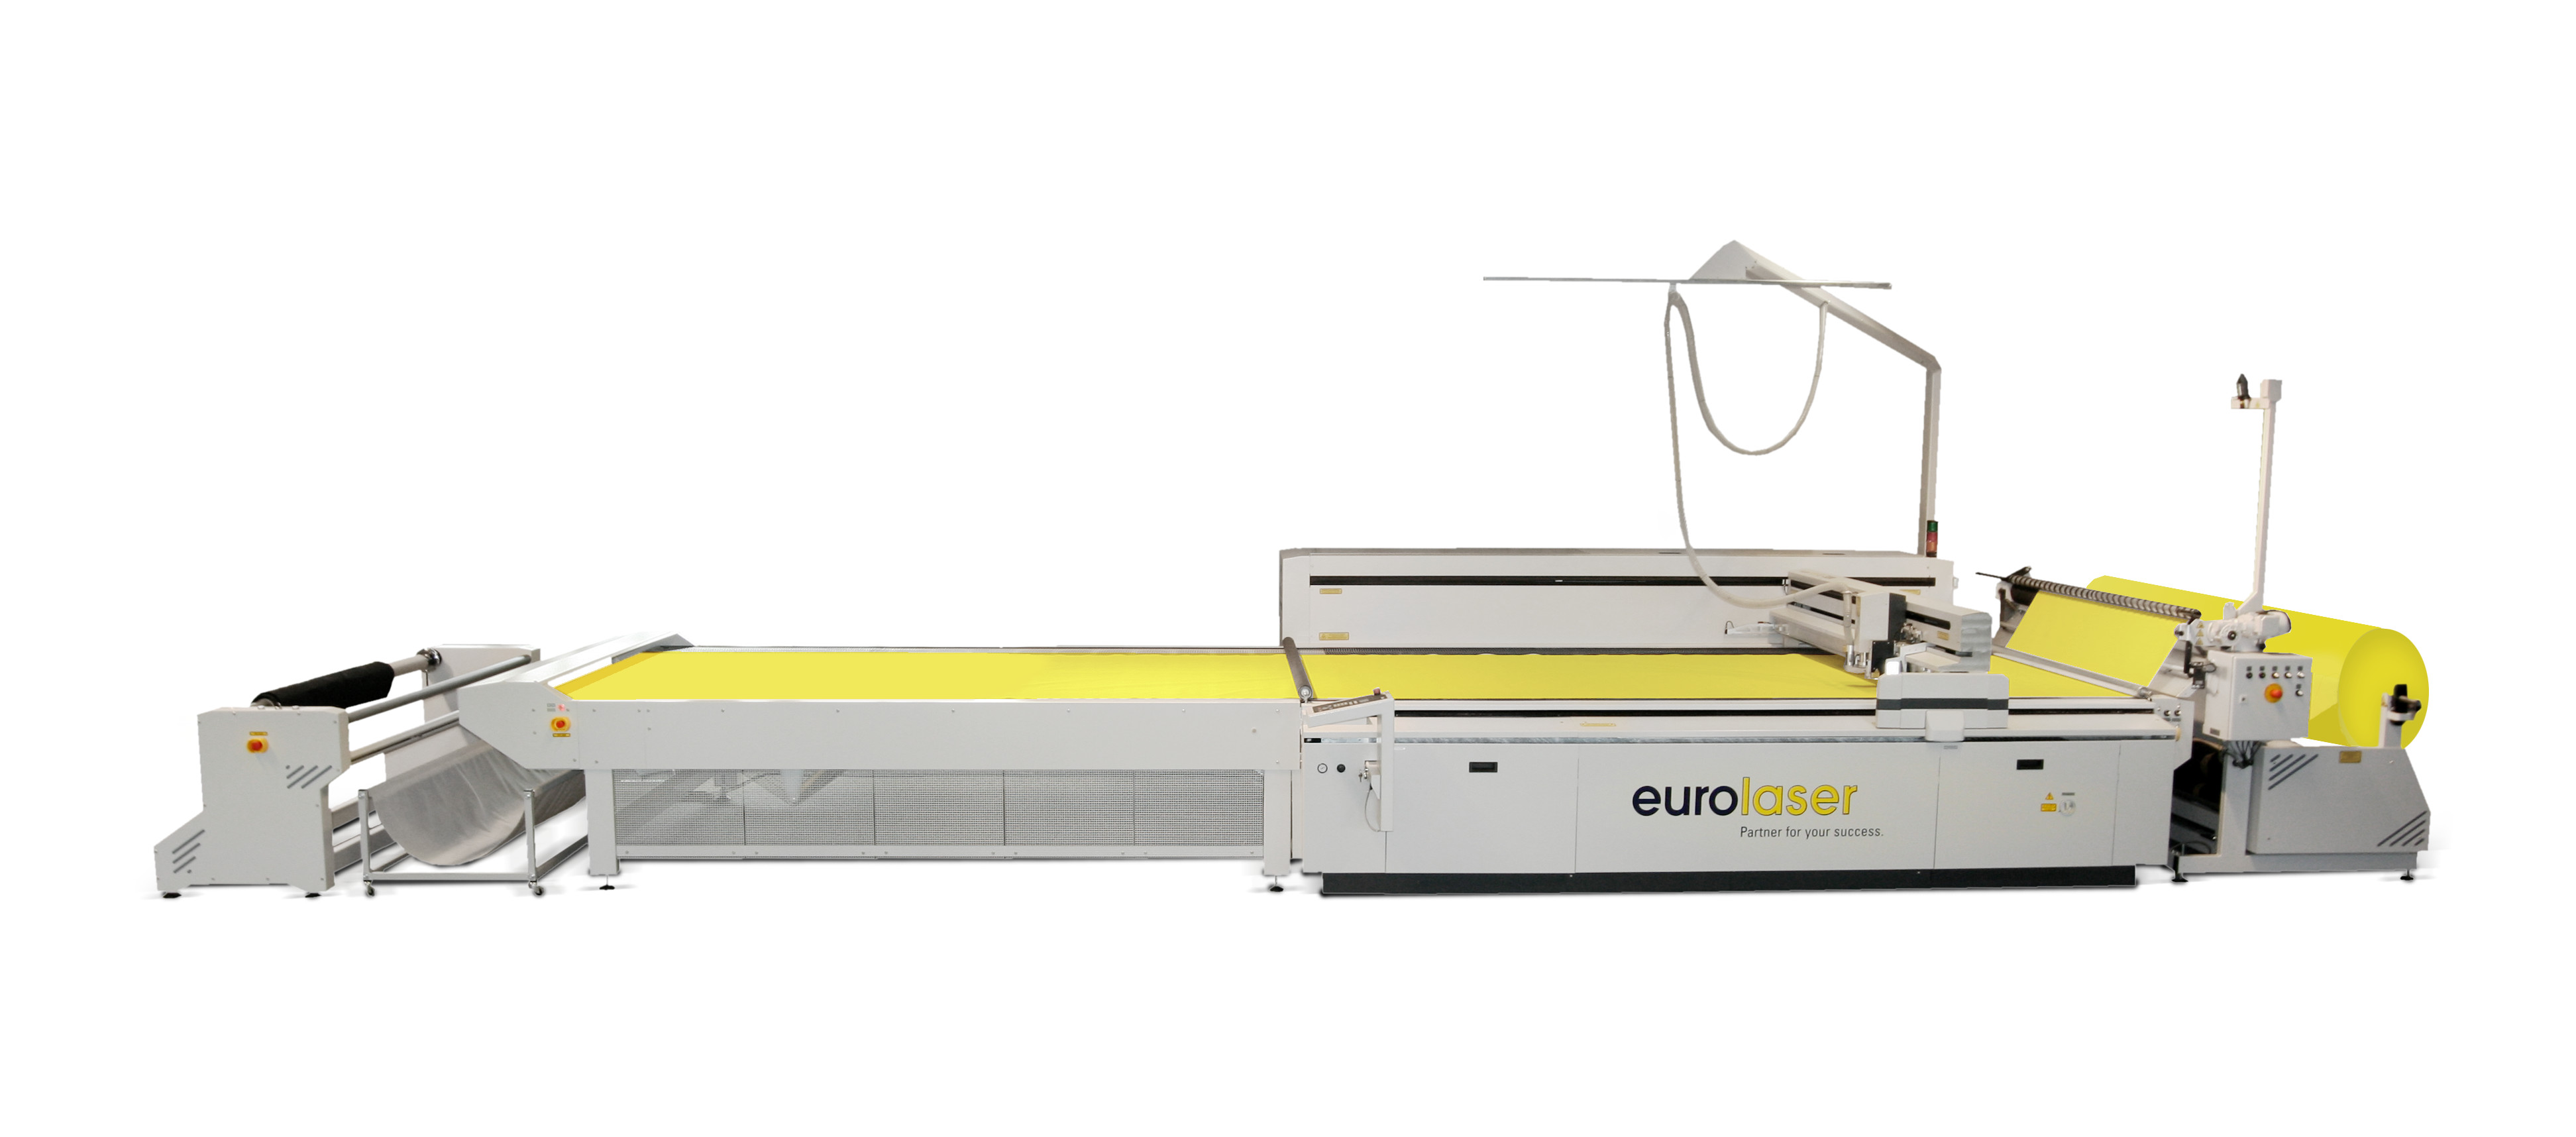 eurolaser_L-3200 Conveyor_Panorama_Rolle